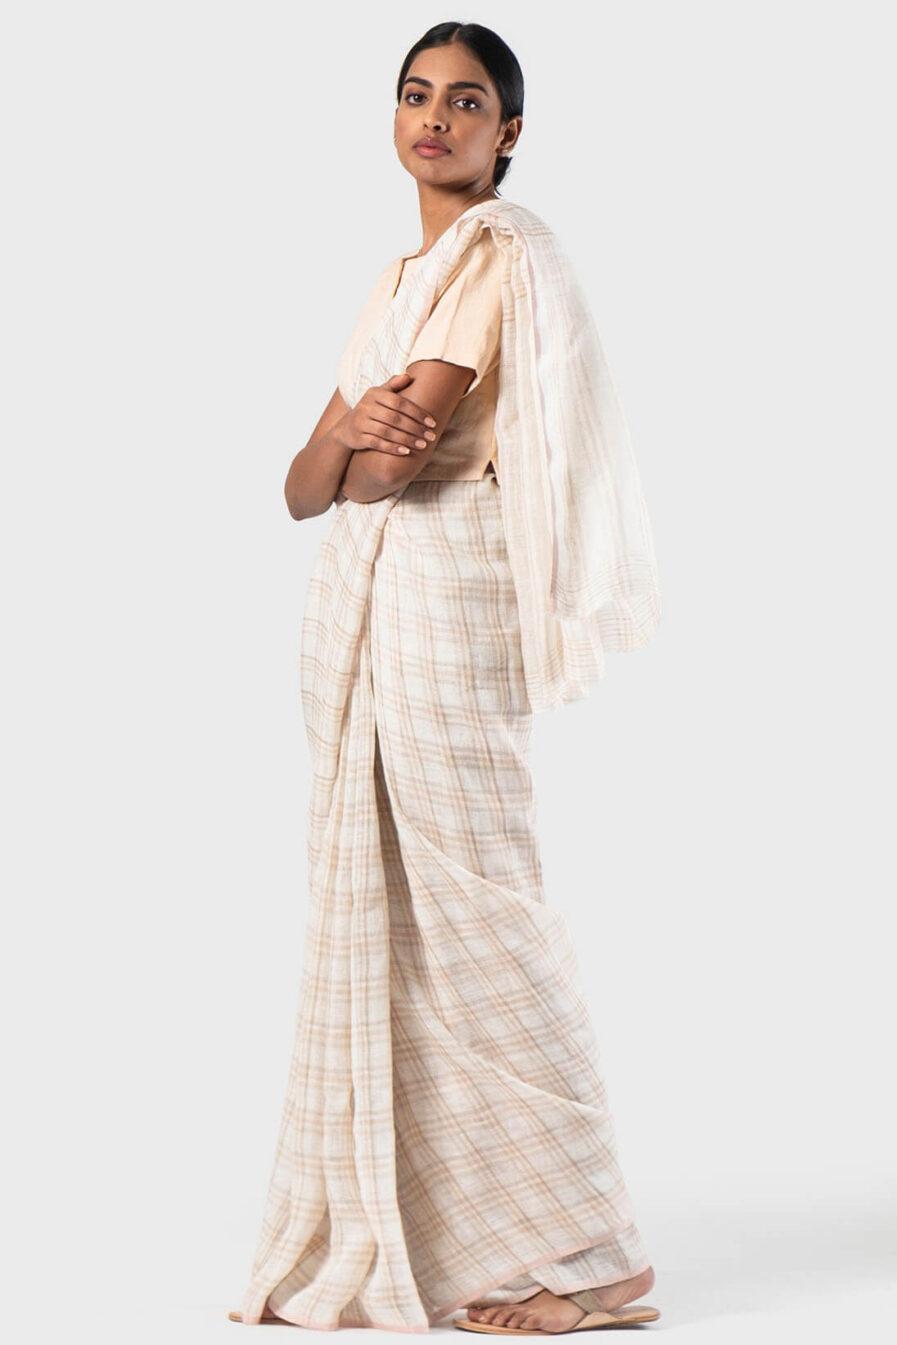 Anavila Ivory Summer plaid sari